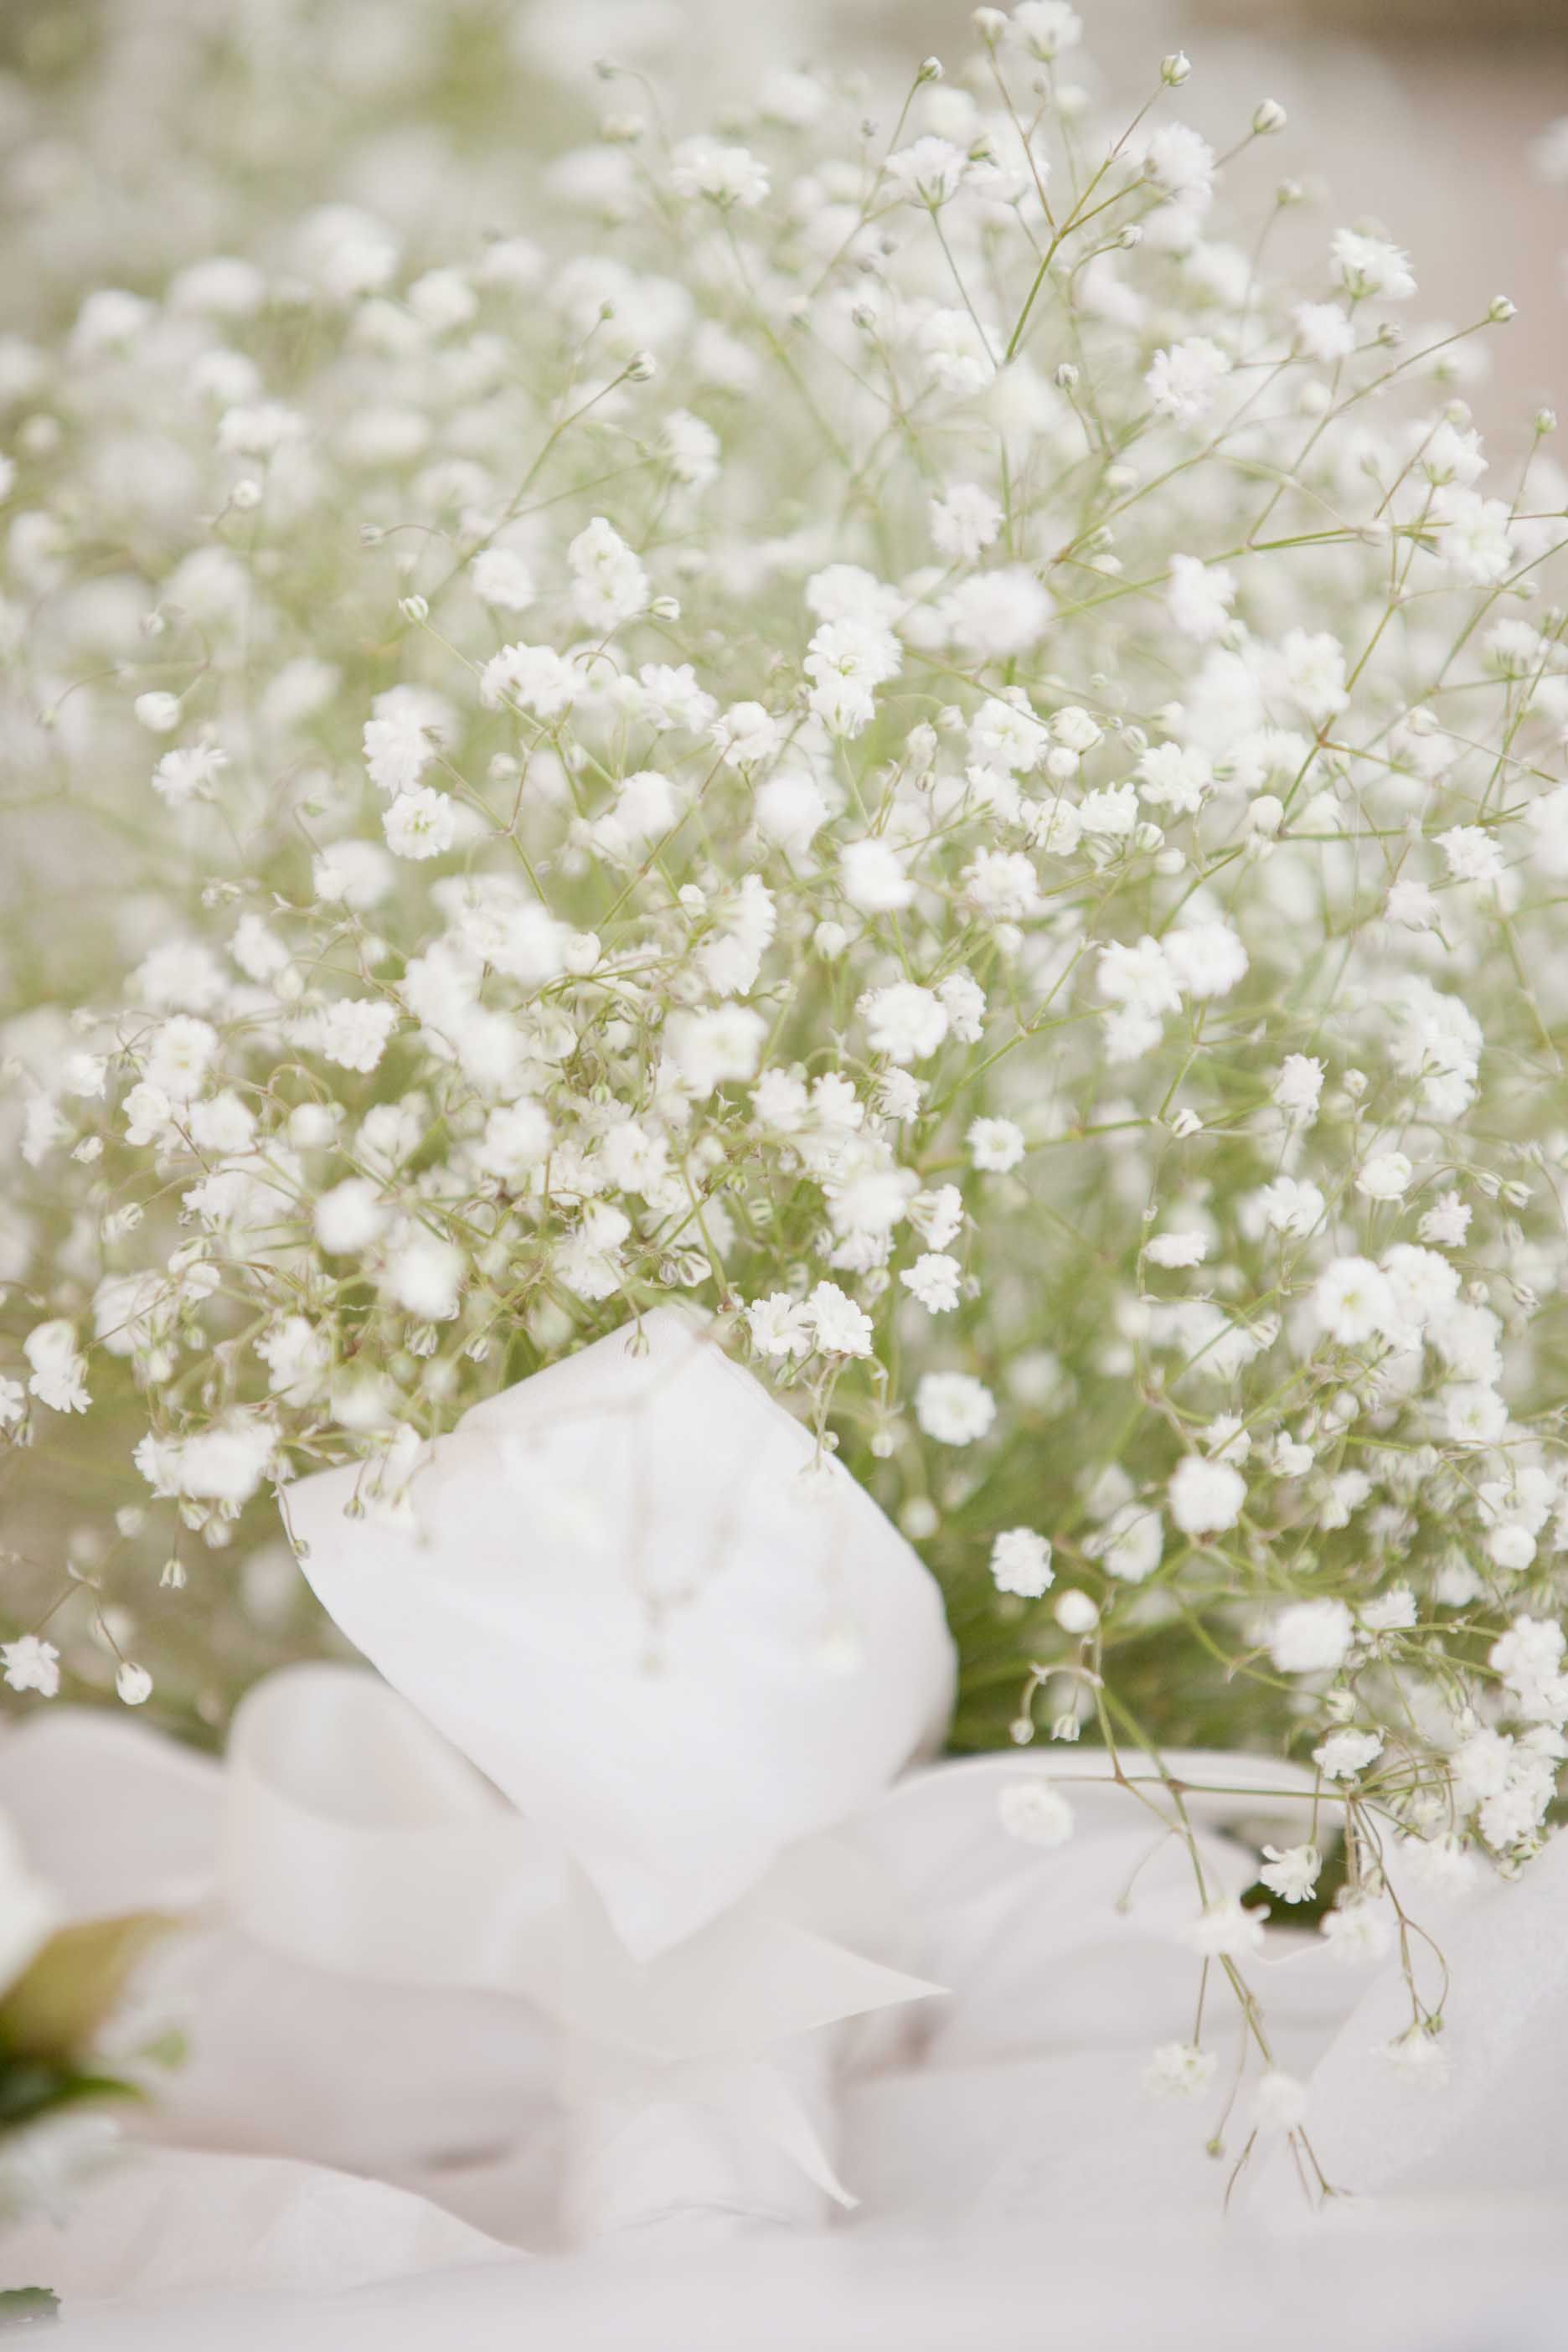 Gypsophlia Babies Breath Bouquet Woodstock Florist Www Woodstock Co Nz Babys Breath Bouquet Babys Breath Wedding Bouquets